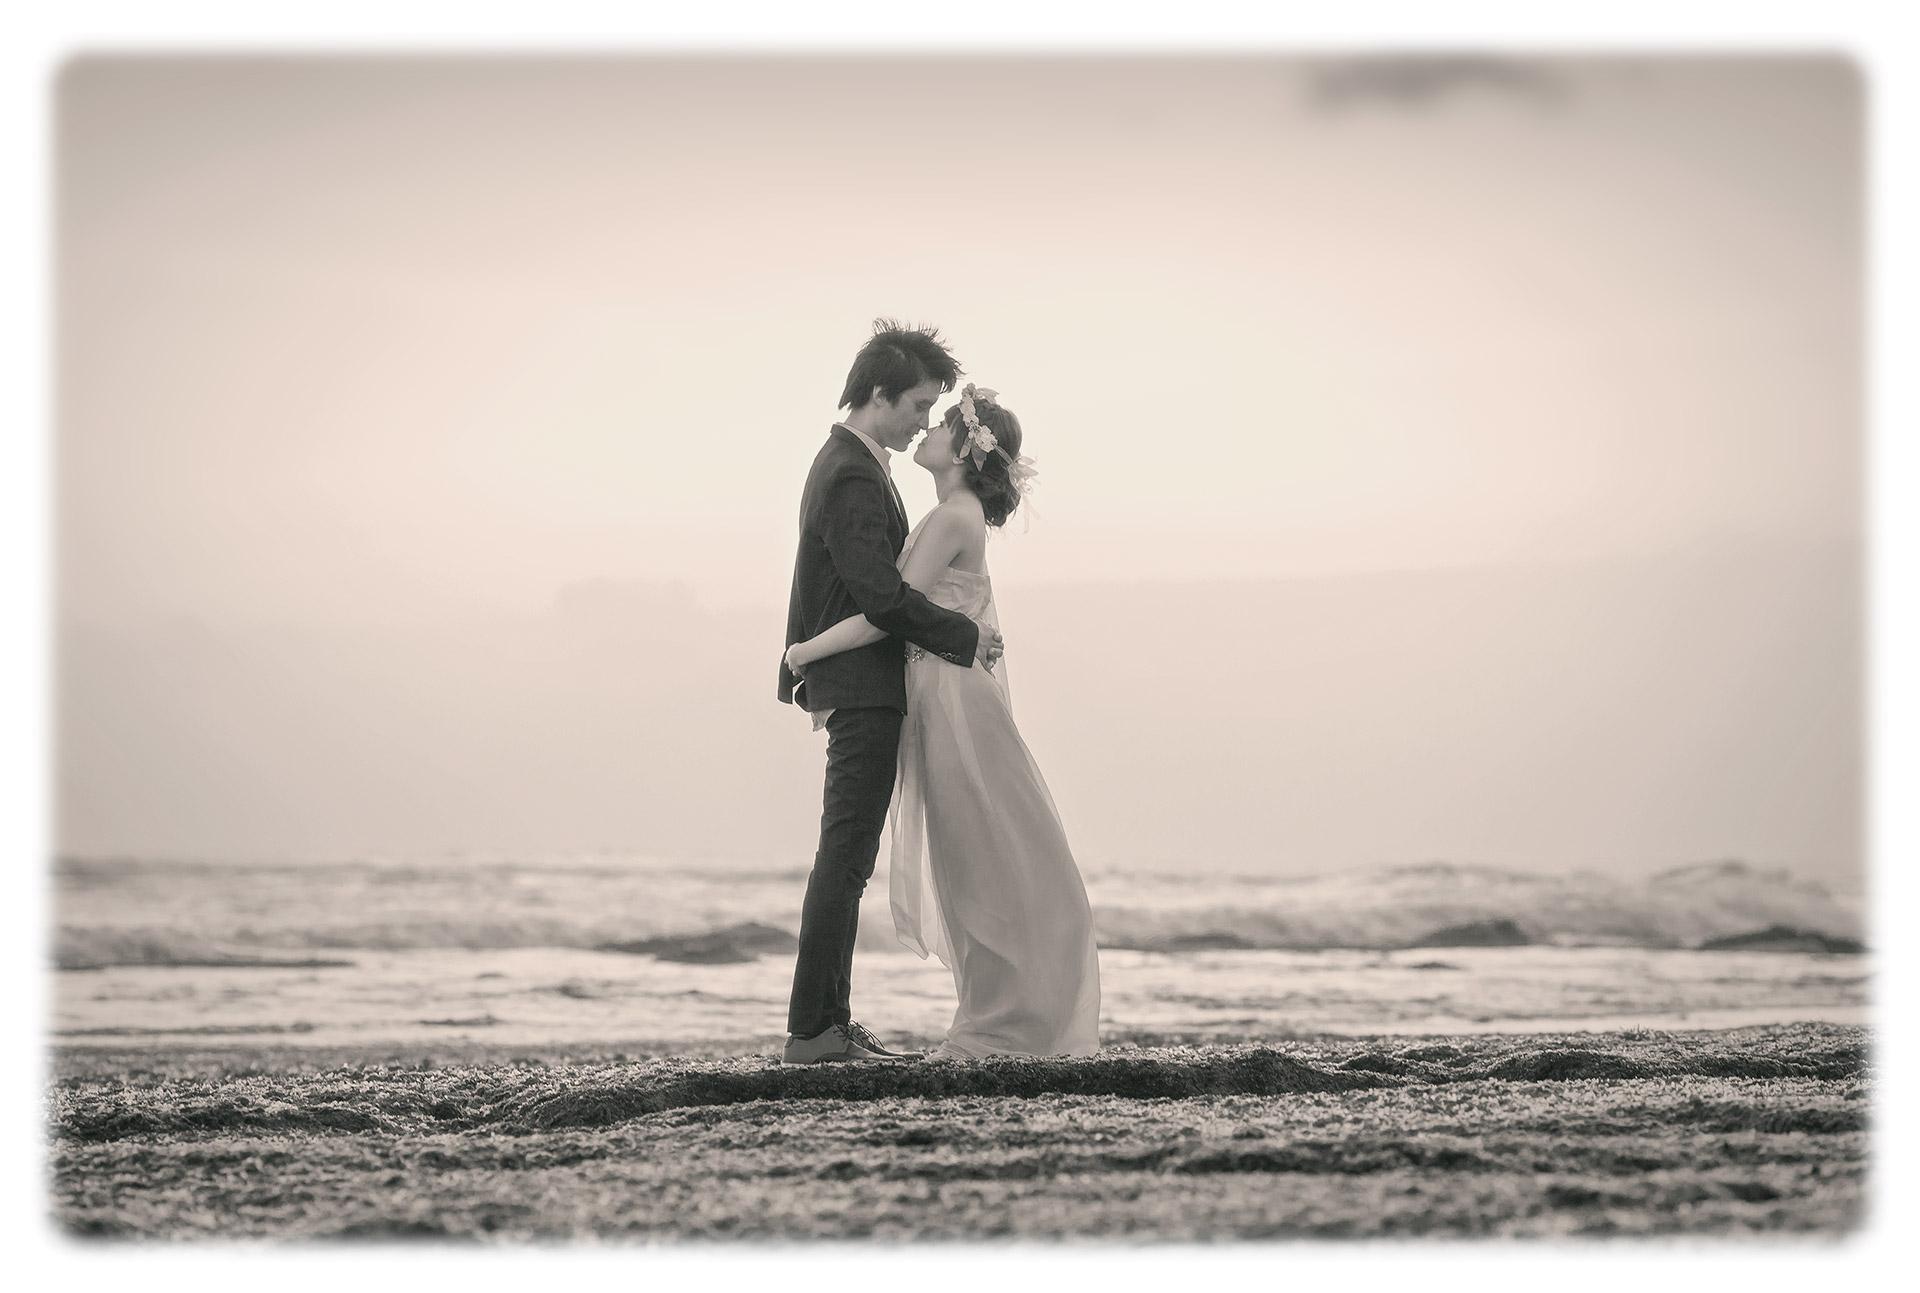 BALI PRE WEDDING